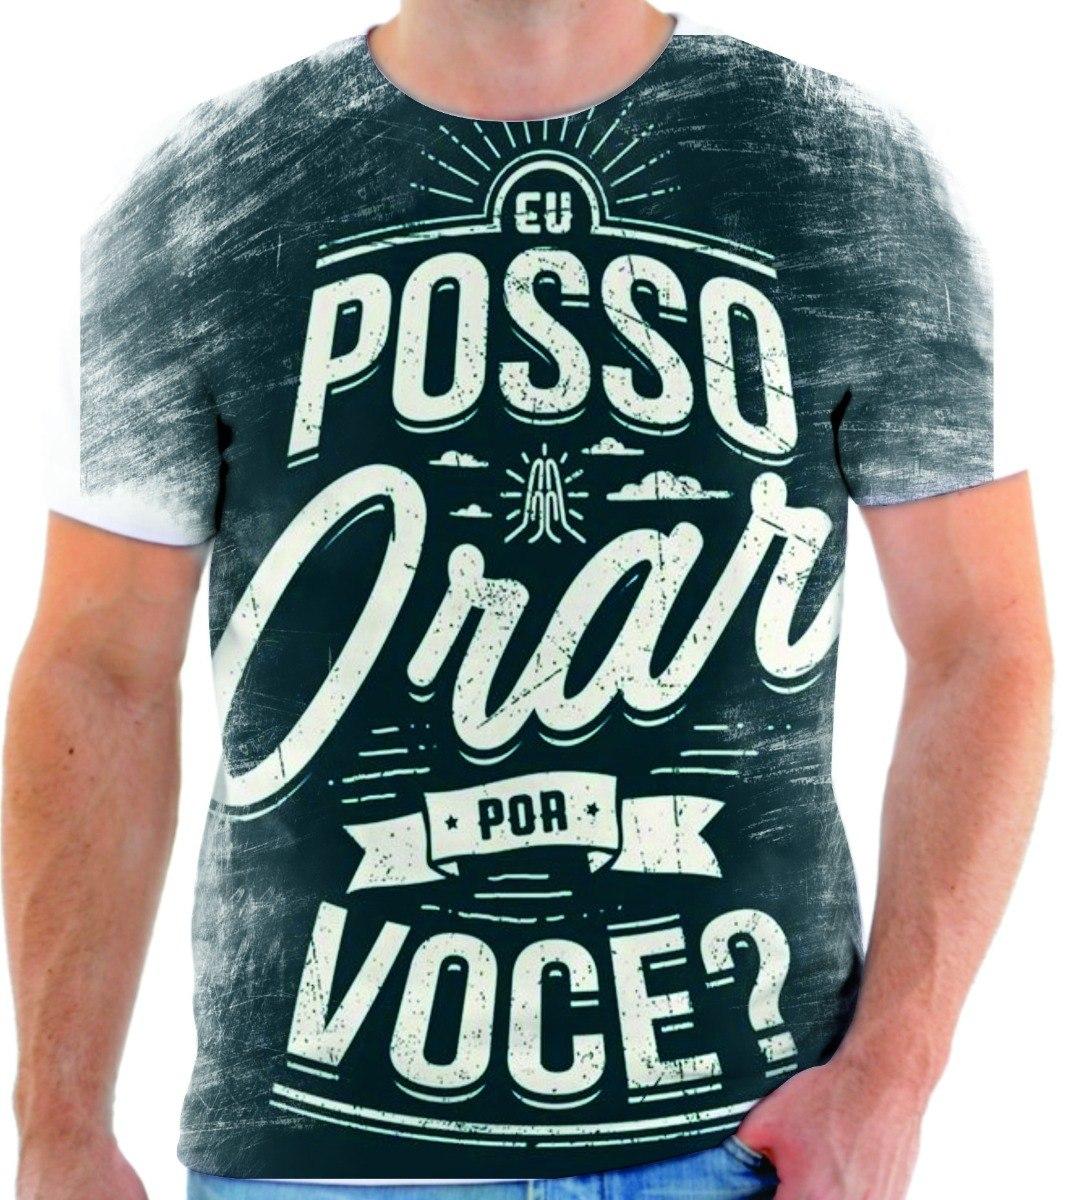 Camiseta Camisa Personalizada Estampa Gospel Ref. 422 - R  49 3c9b48a0e7448